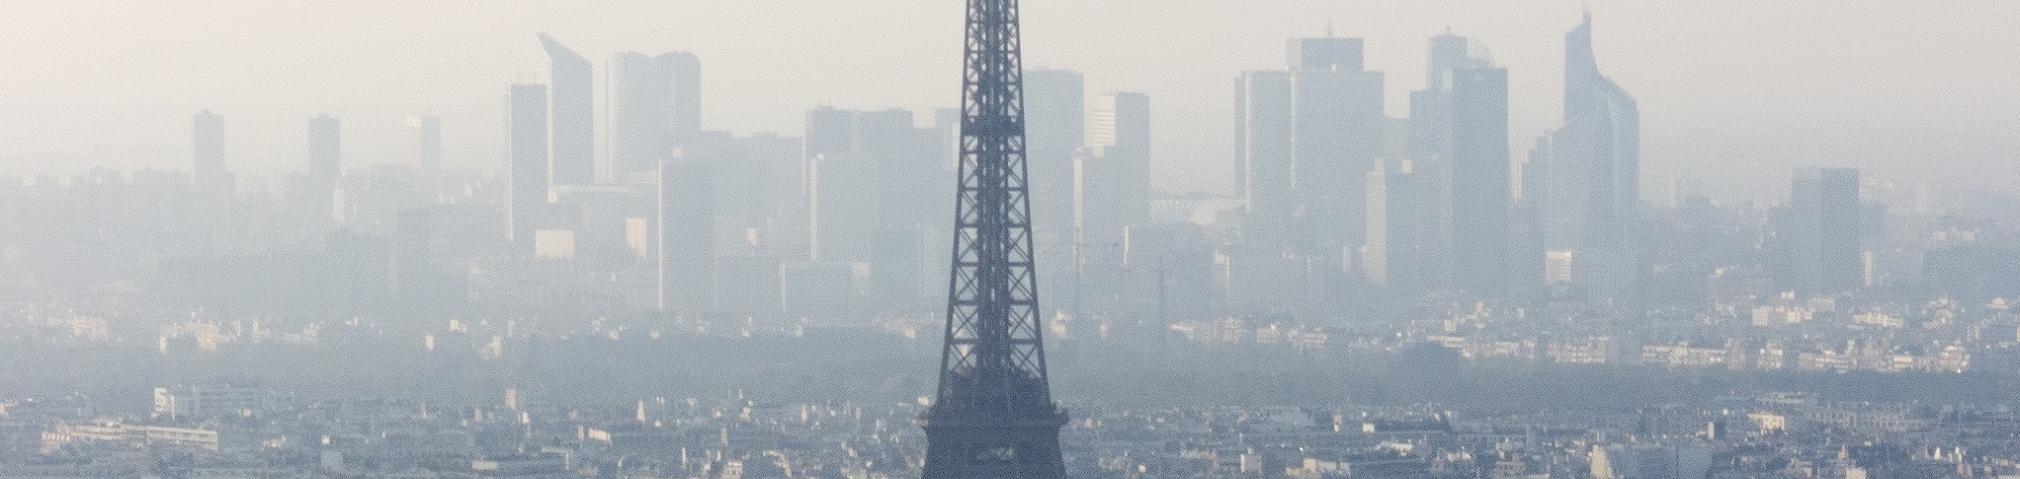 Pollution air en ville